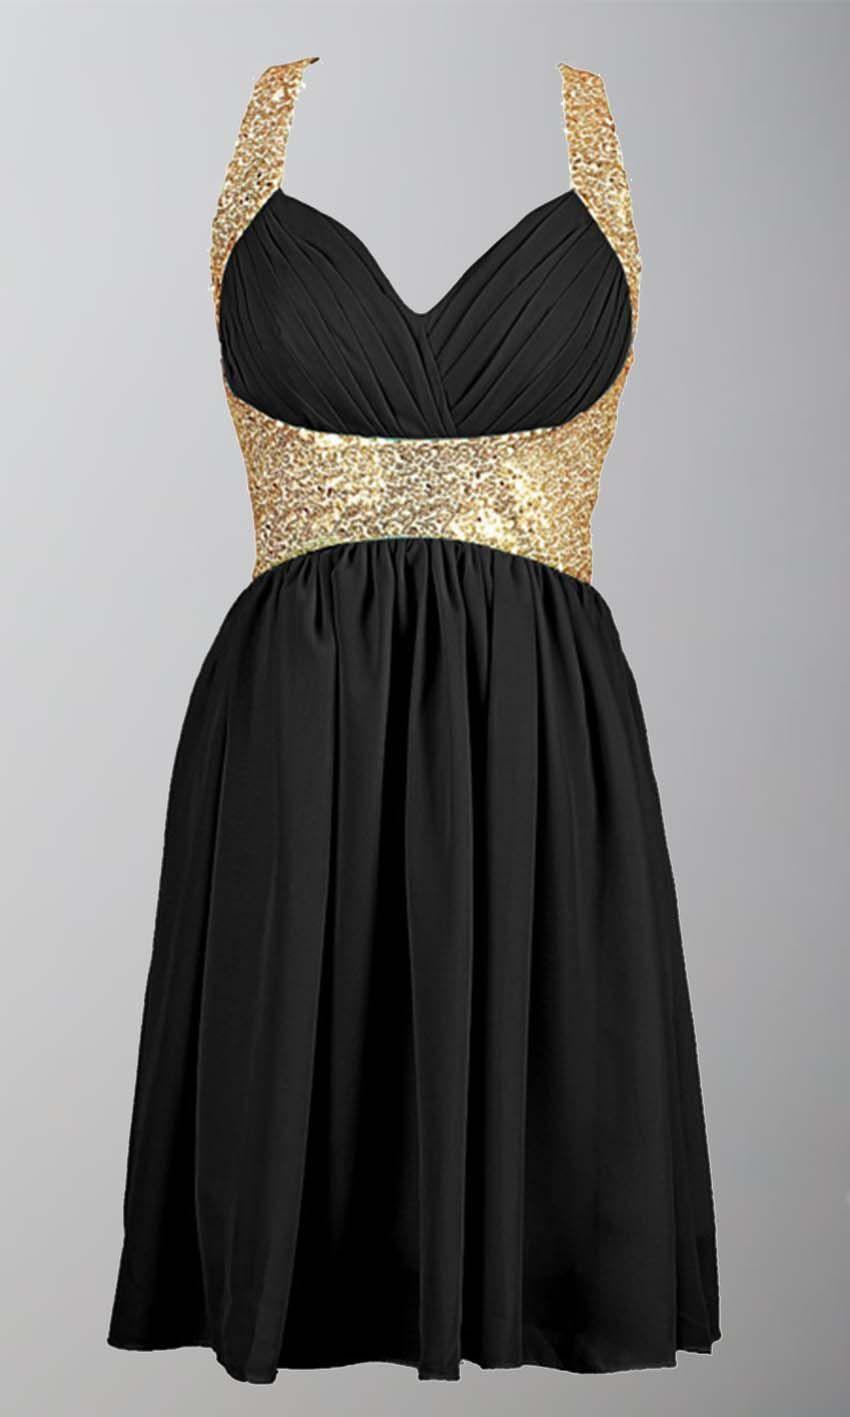 Black and Gold Sequin Short Prom Dresses UK KSP380 | uk prom dresses ...